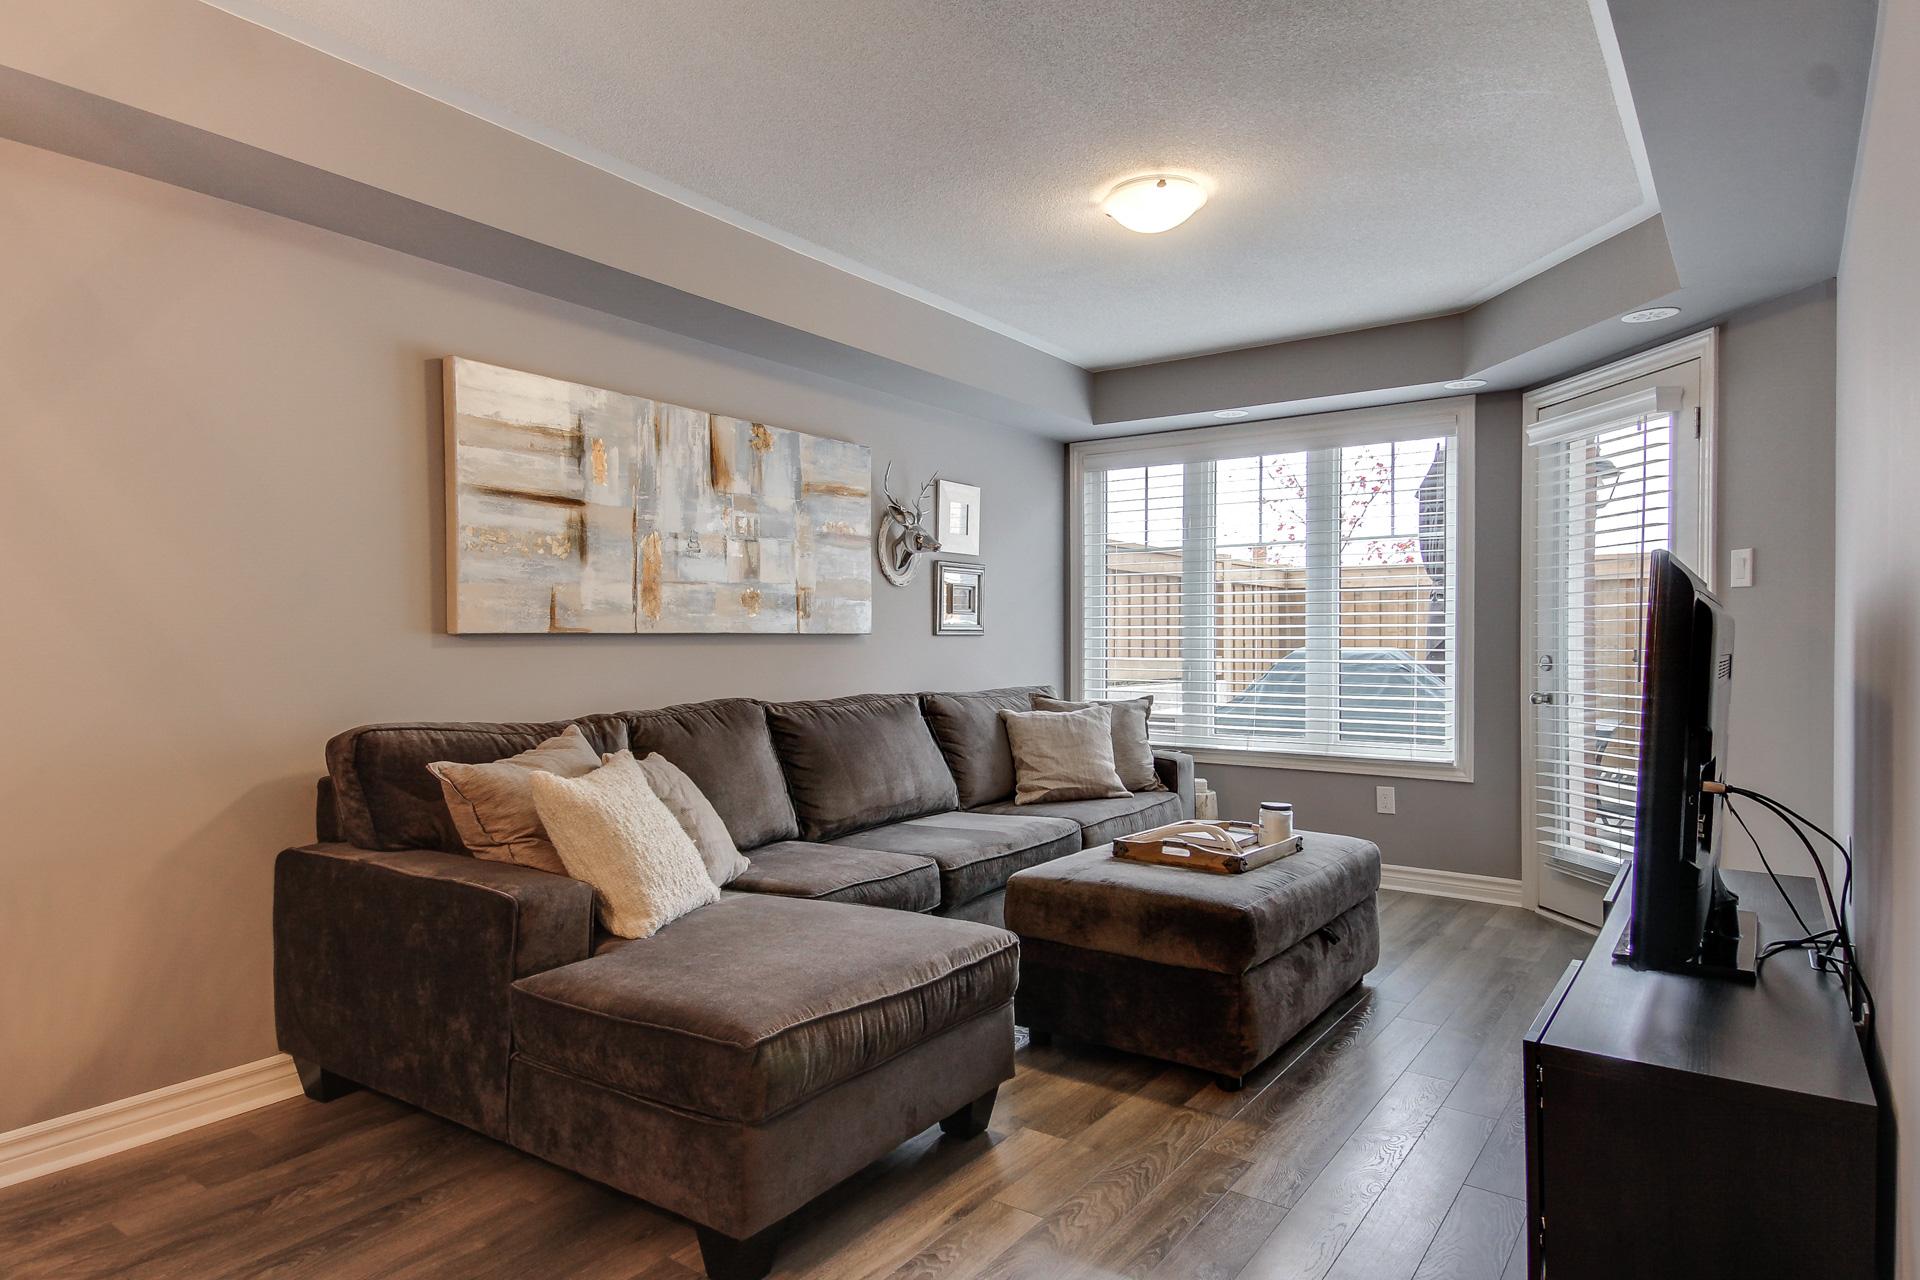 2420-Baronwood-Drive-2201-Oakville-For-Sale-Karly-Moore (6).jpg